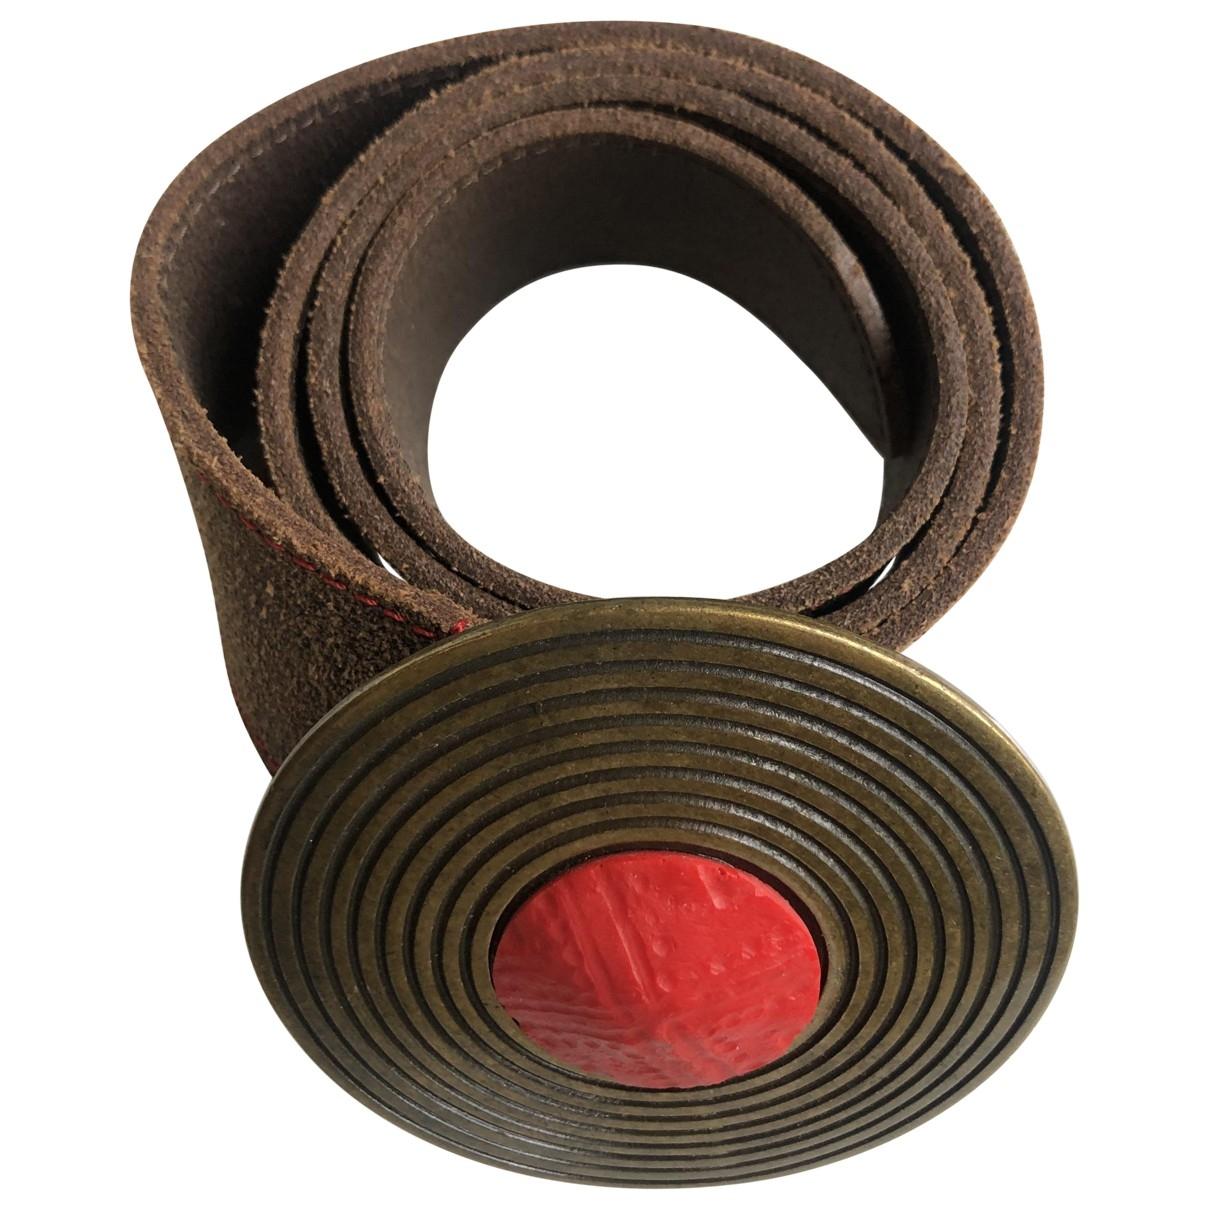 Roberto Cavalli \N Brown Leather belt for Women 80 cm